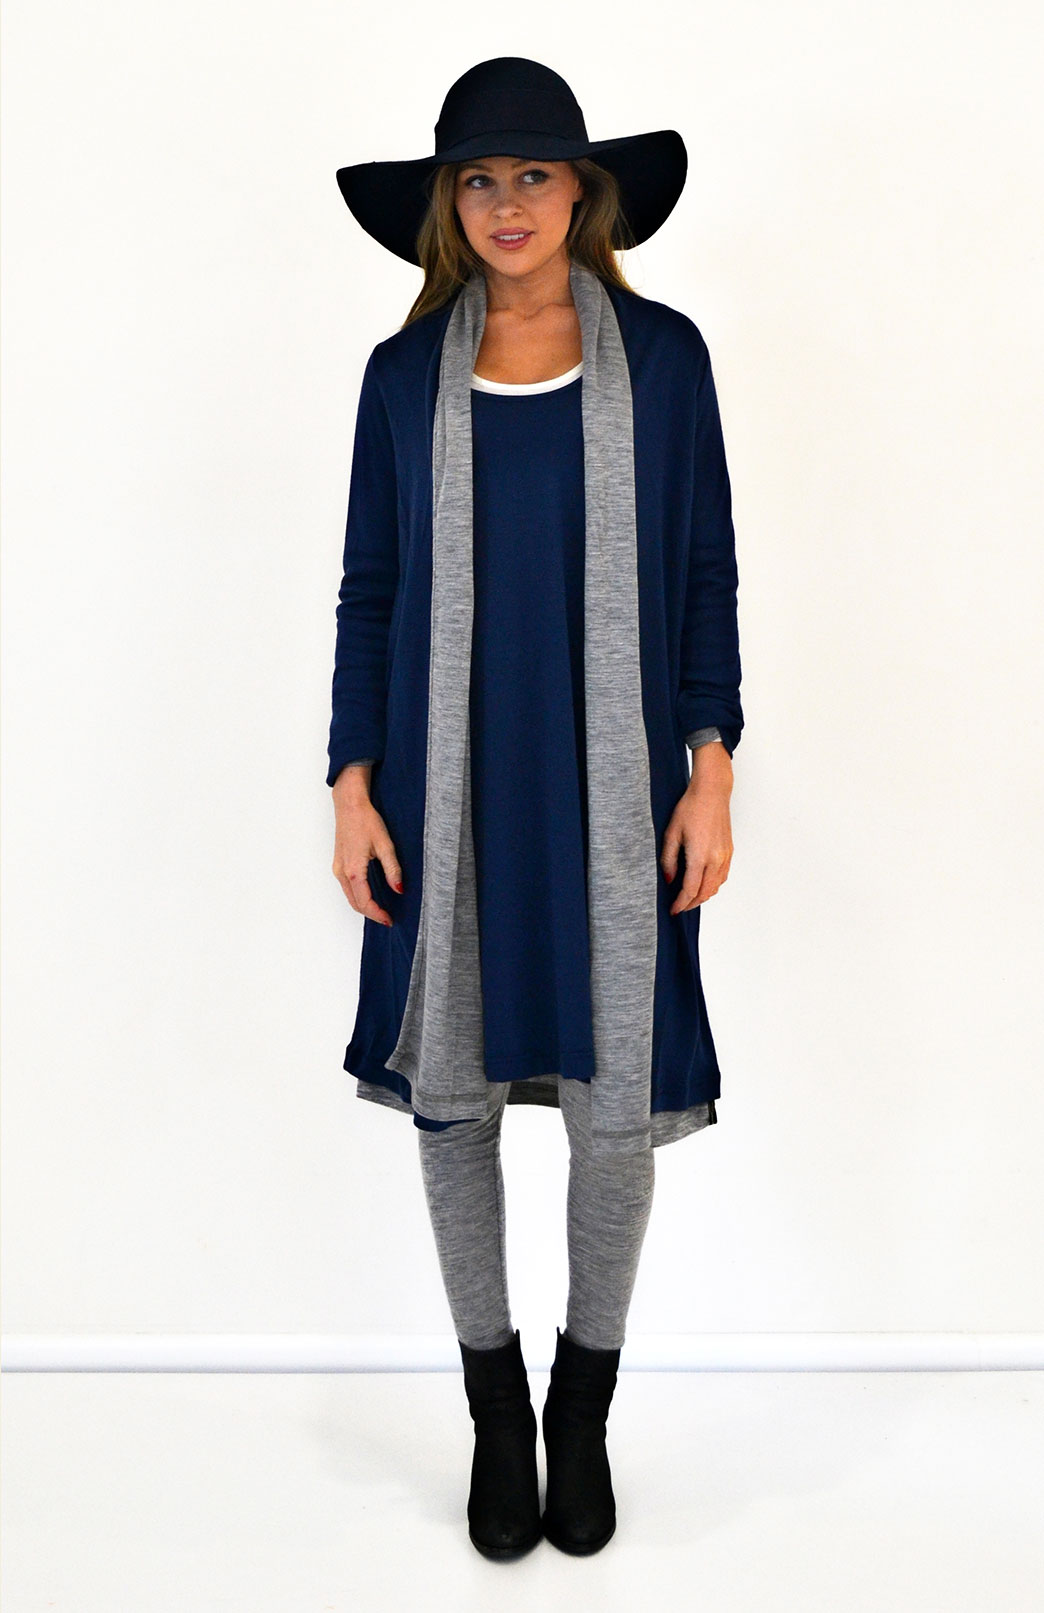 Long Drape Cardigan - Women's Indigo Blue Lightweight Merino Wool Long Drape - Smitten Merino Tasmania Australia